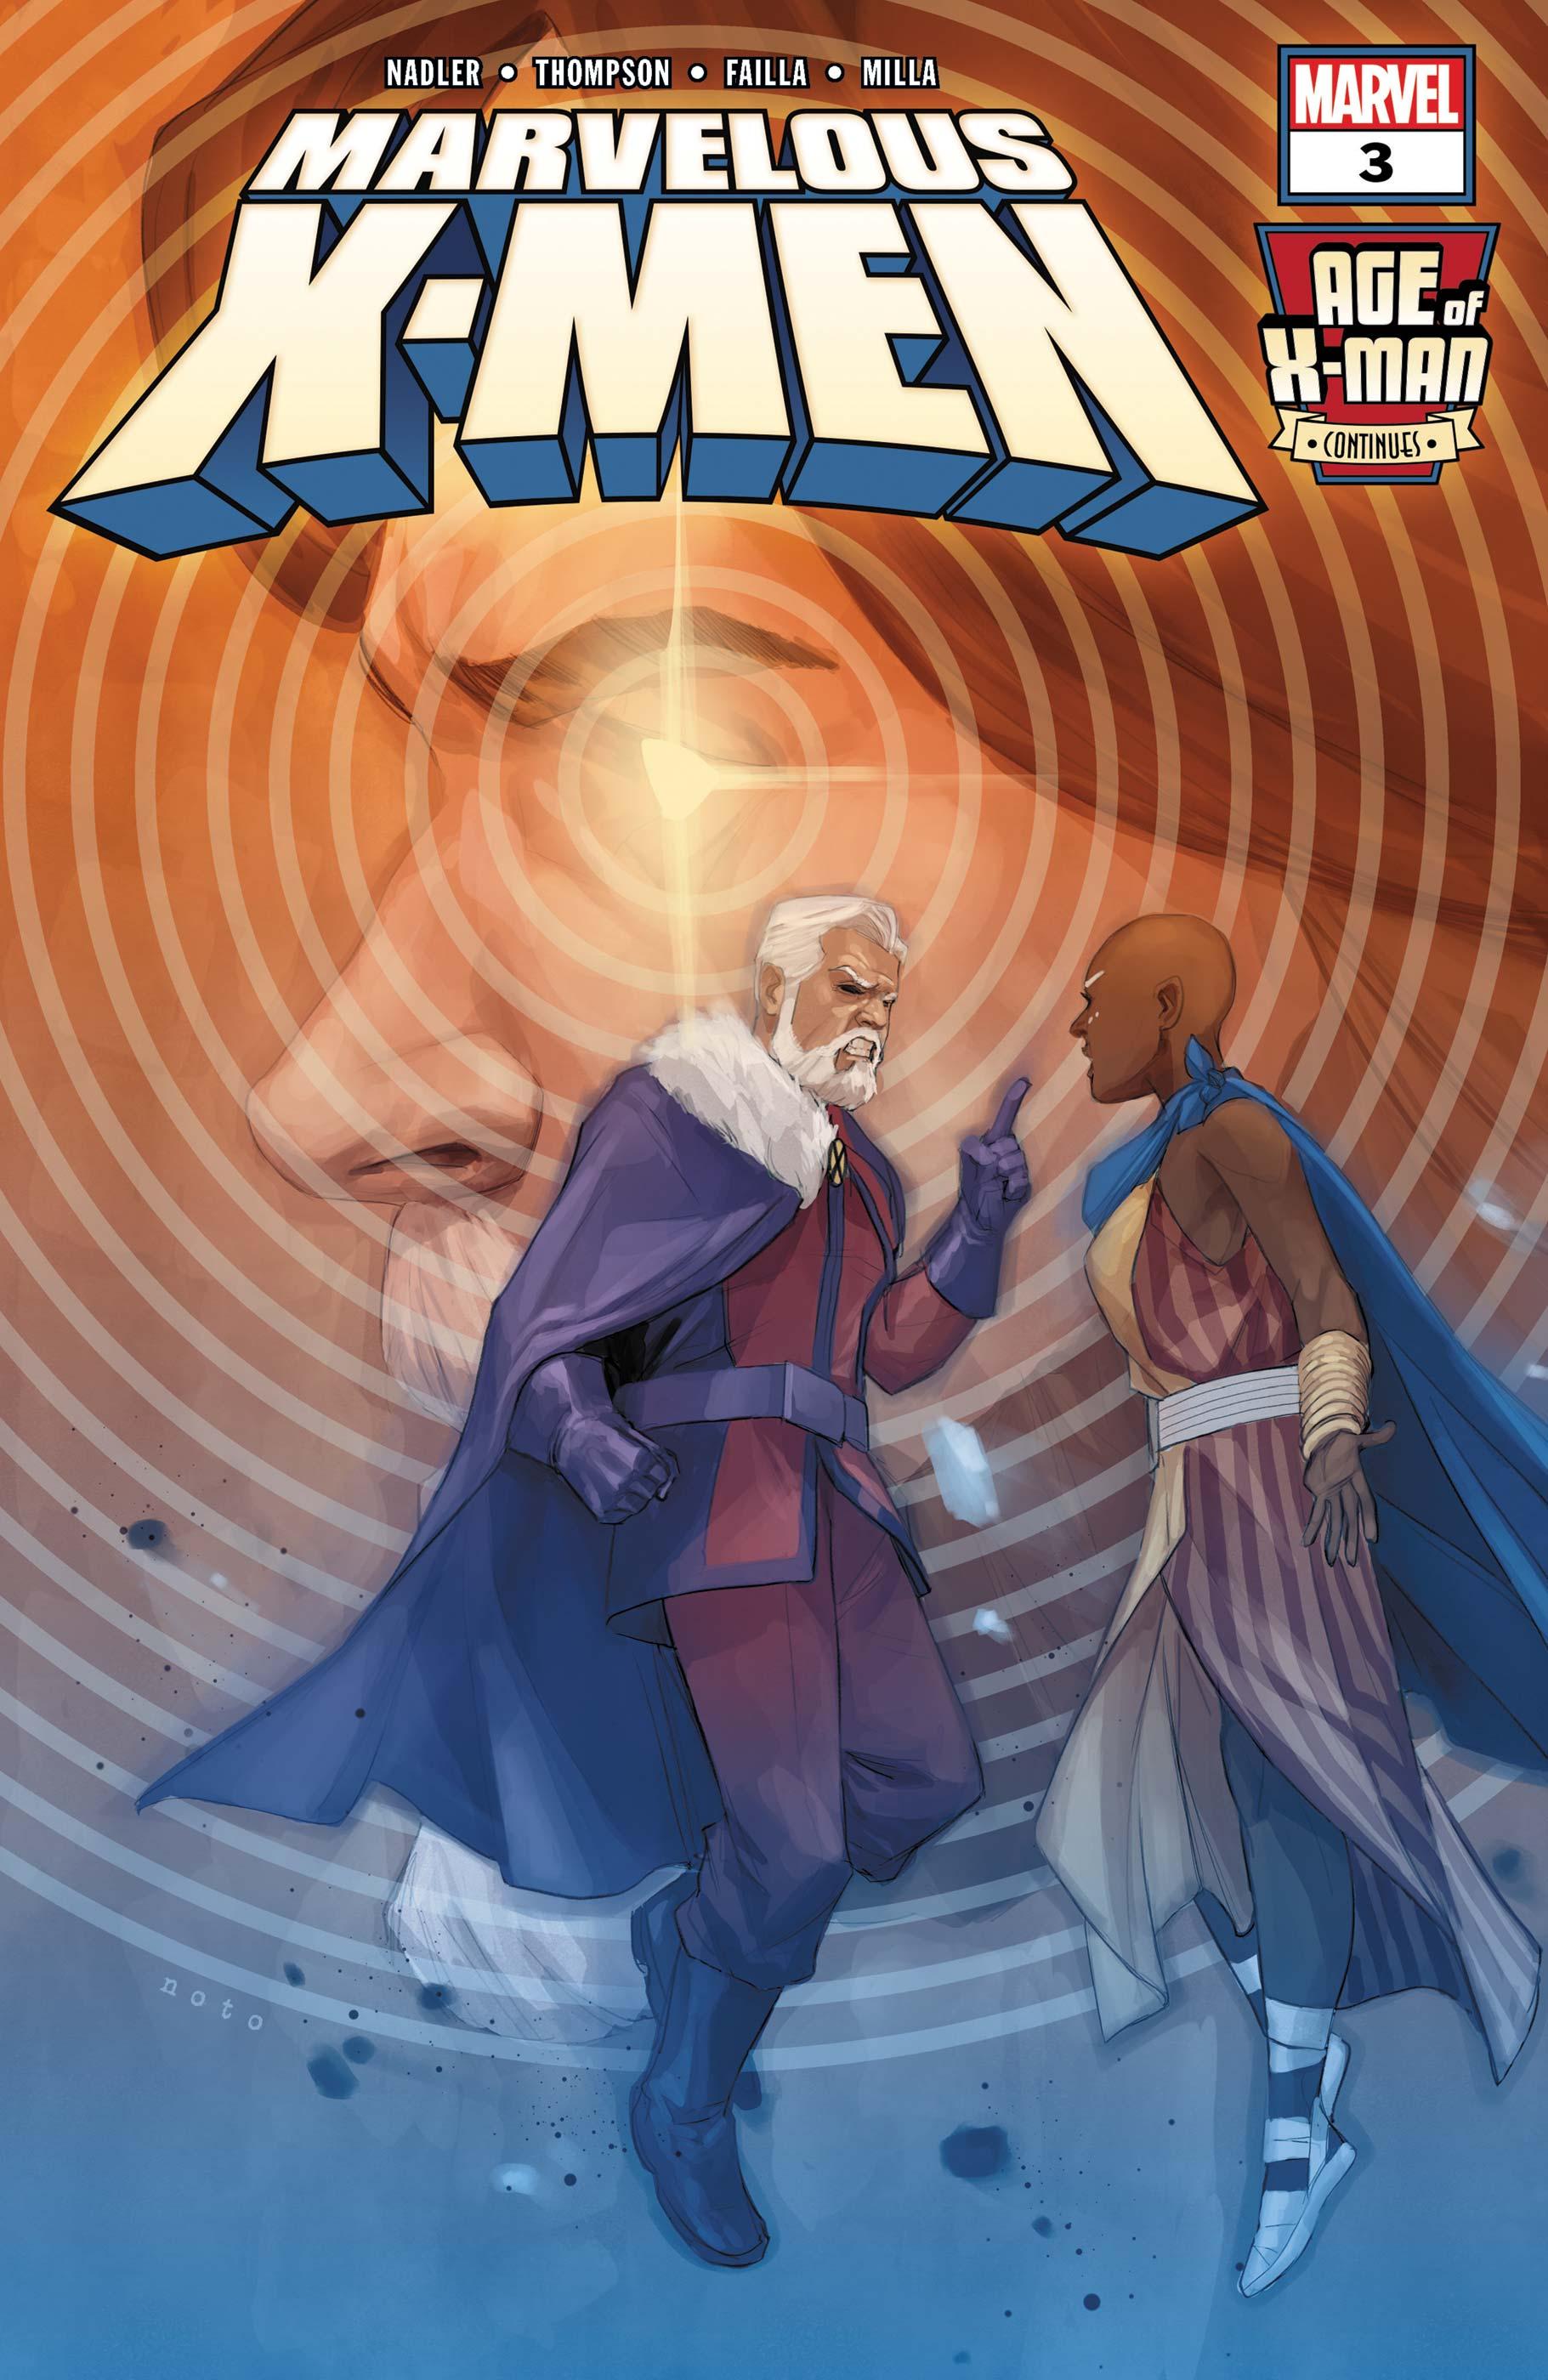 Age of X-Man: The Marvelous X-Men (2019) #3